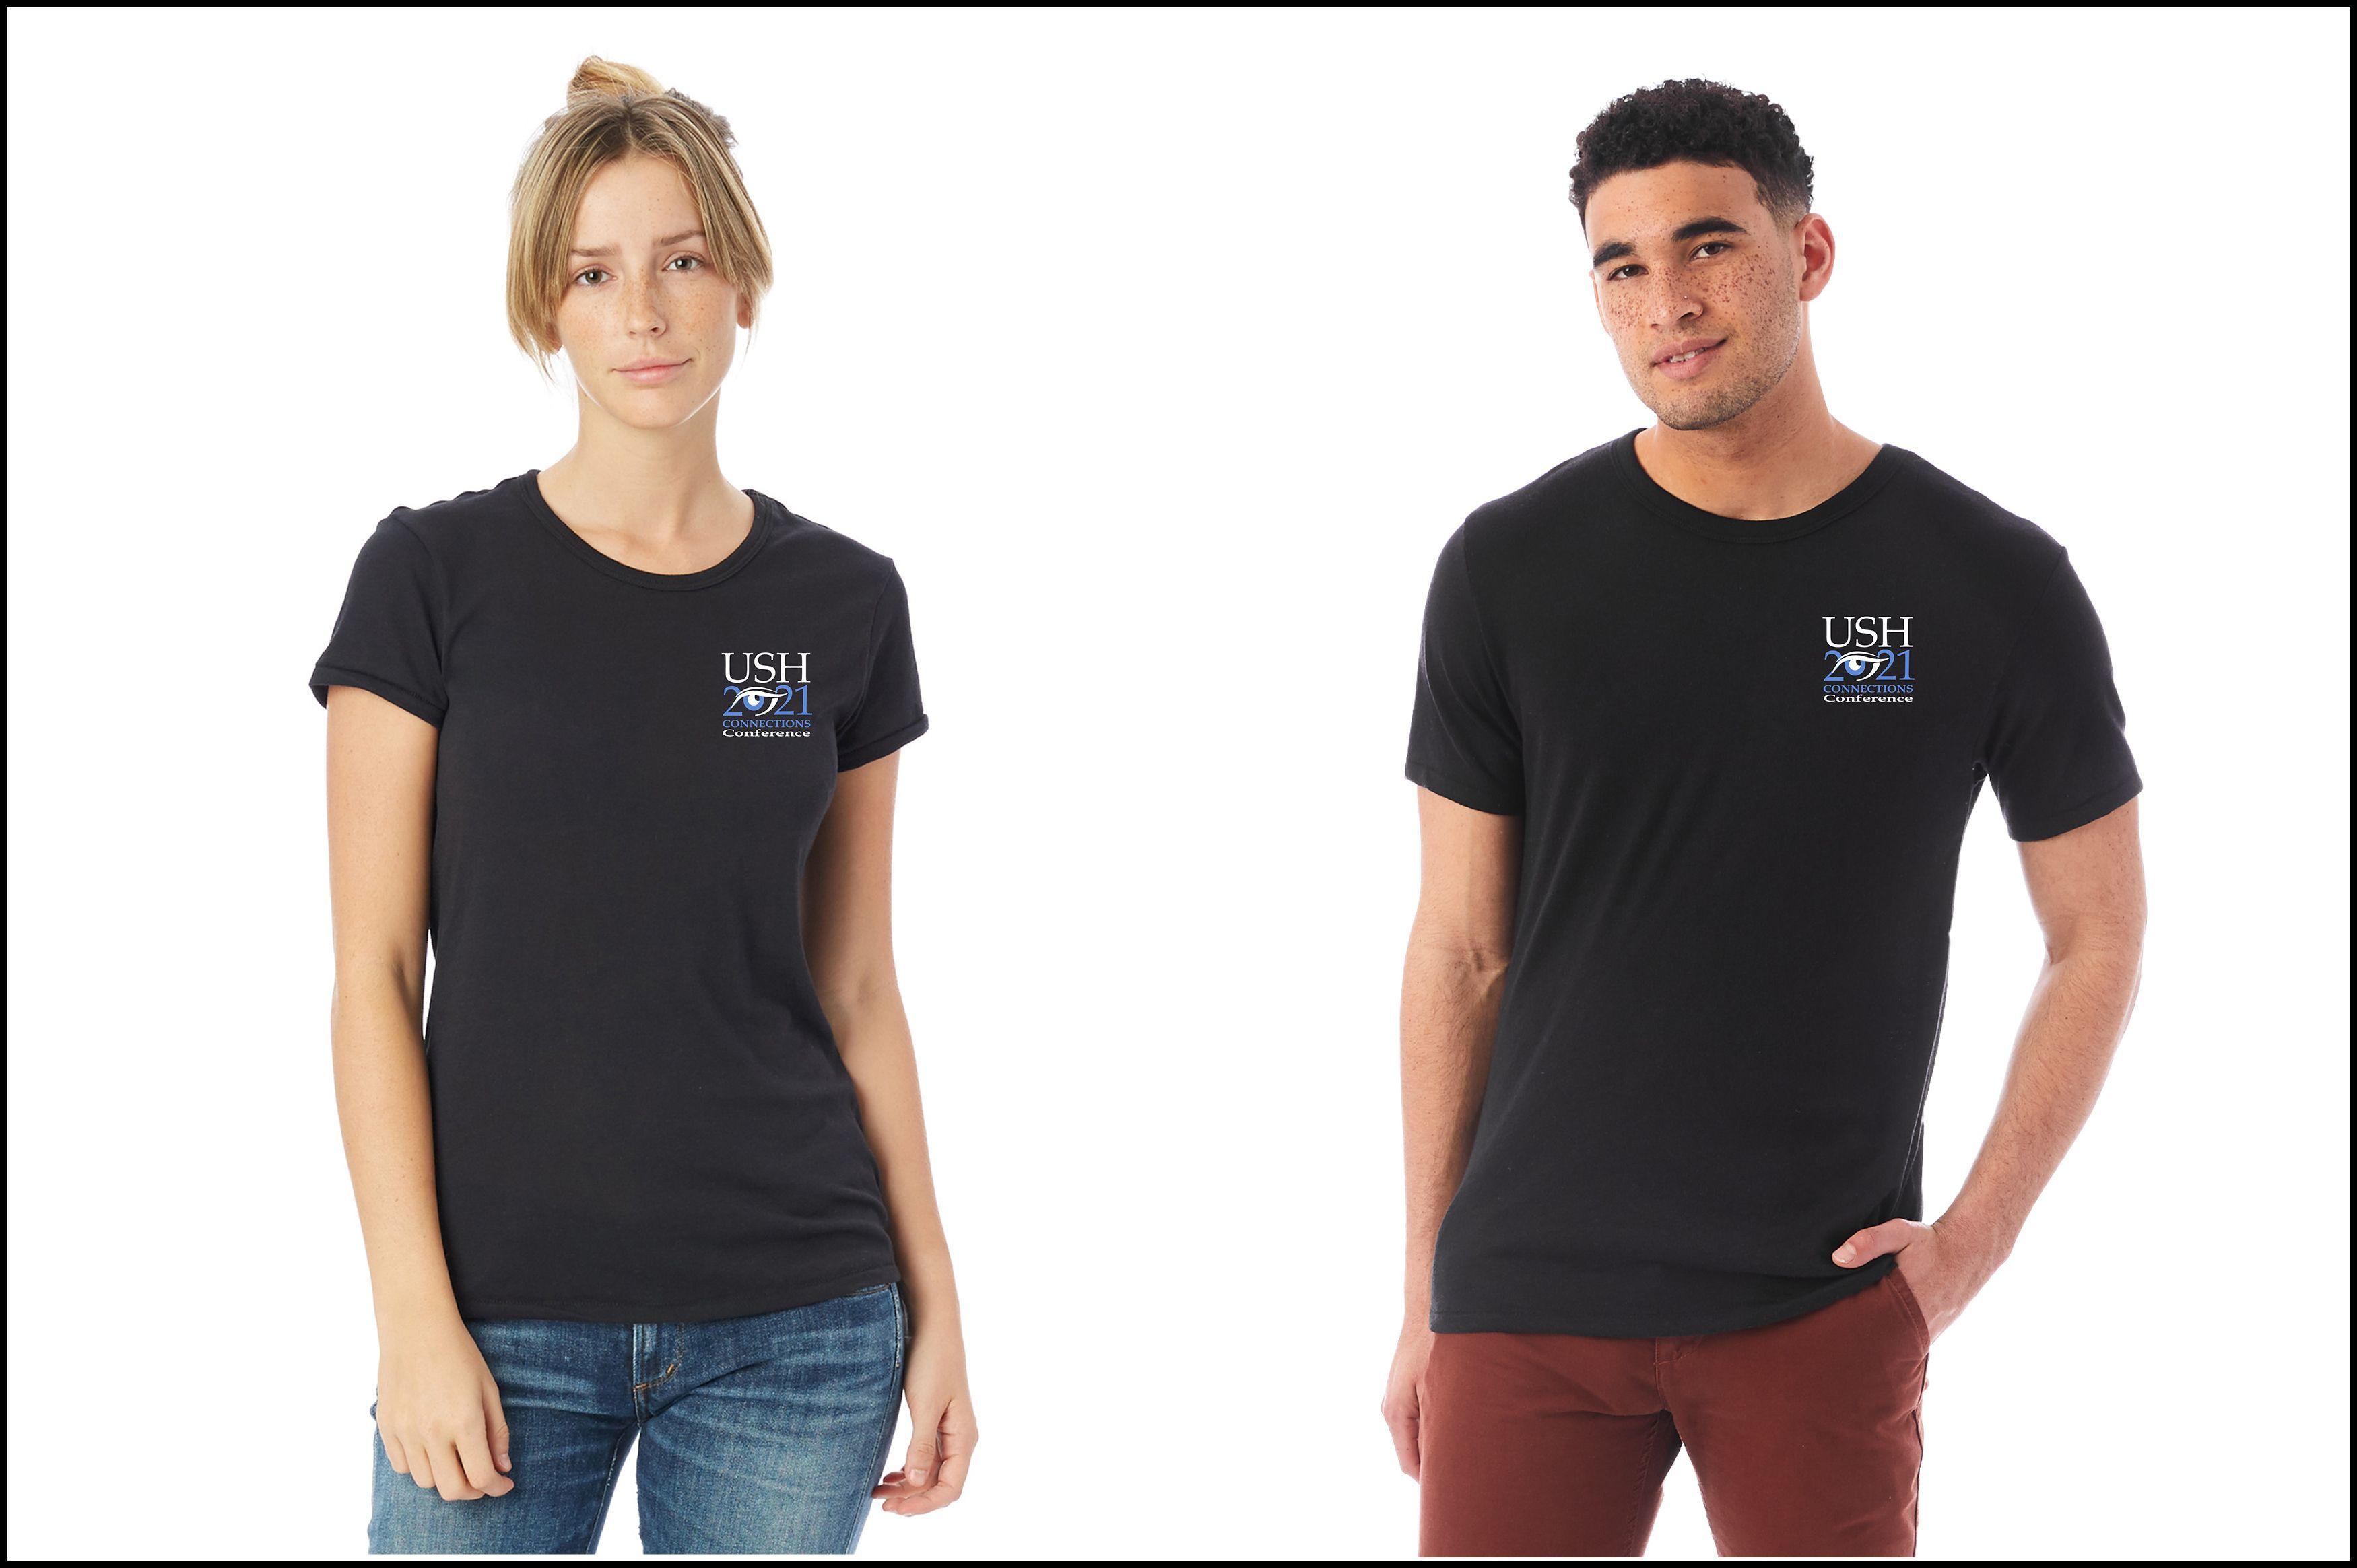 USH2021 Conference T-Shirt